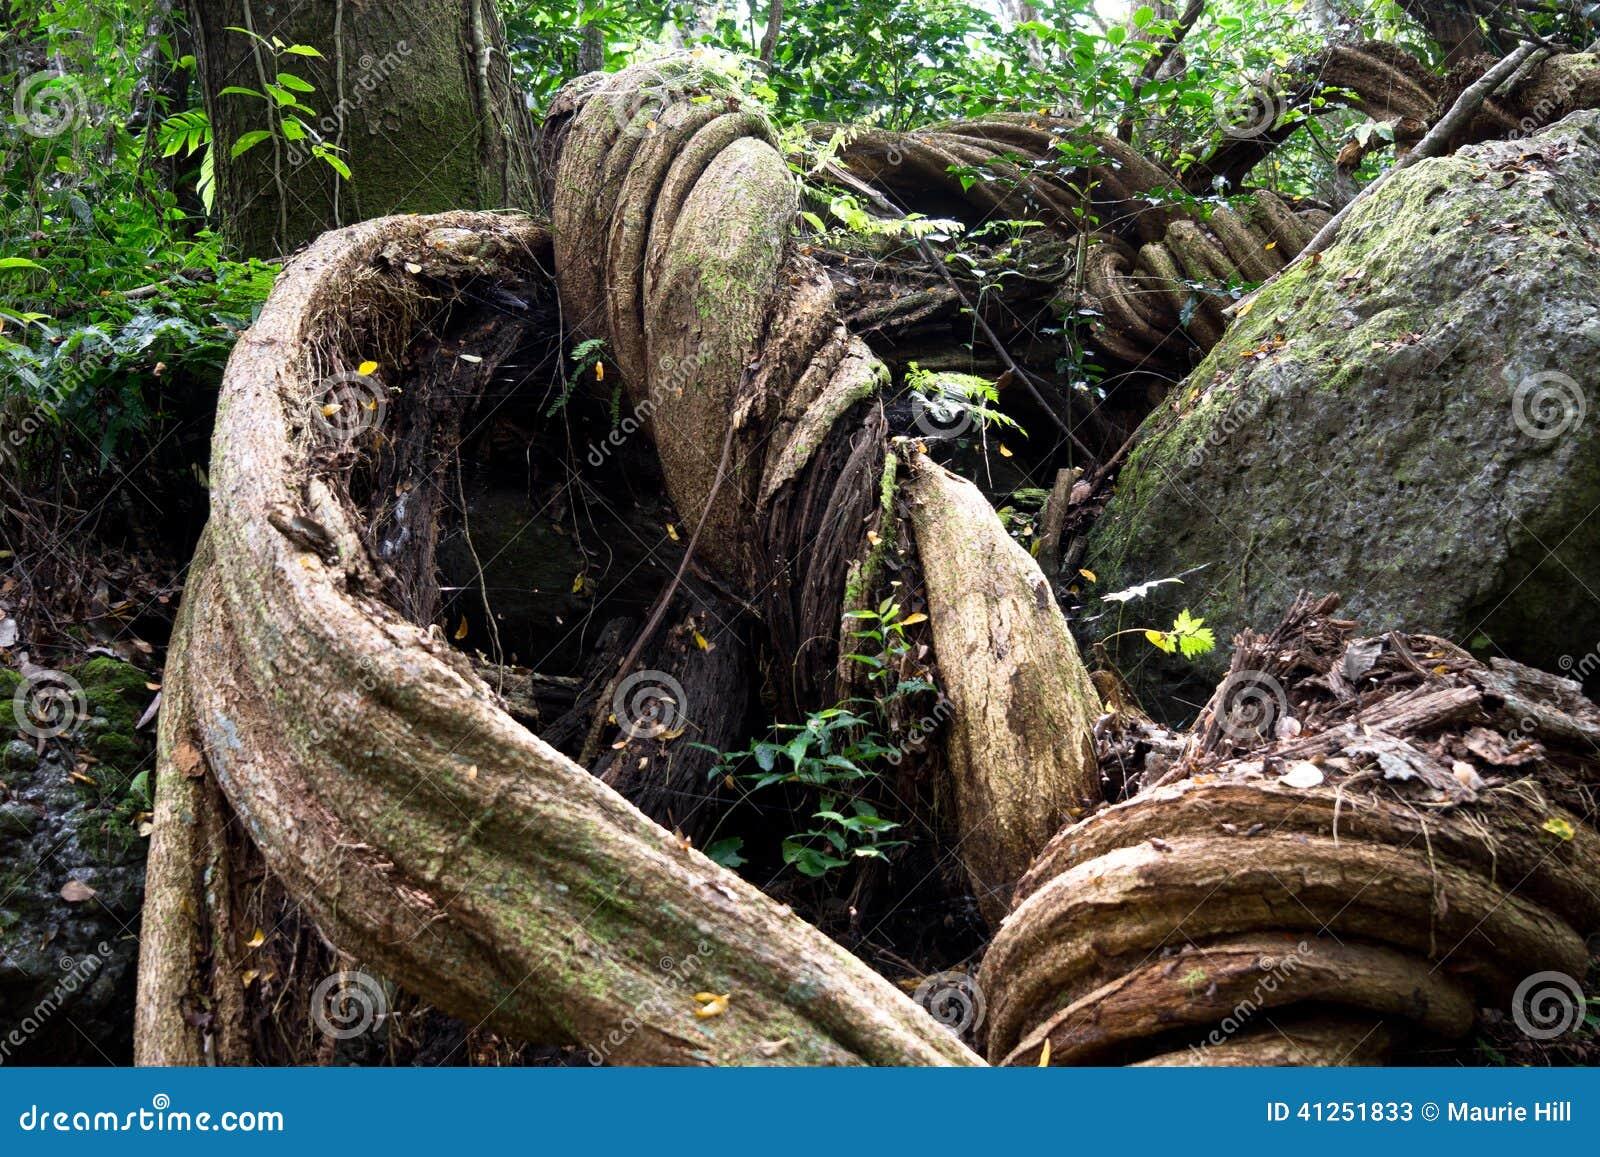 Giant Twisted Tree Roots Fiji Stock Photo Image 41251833